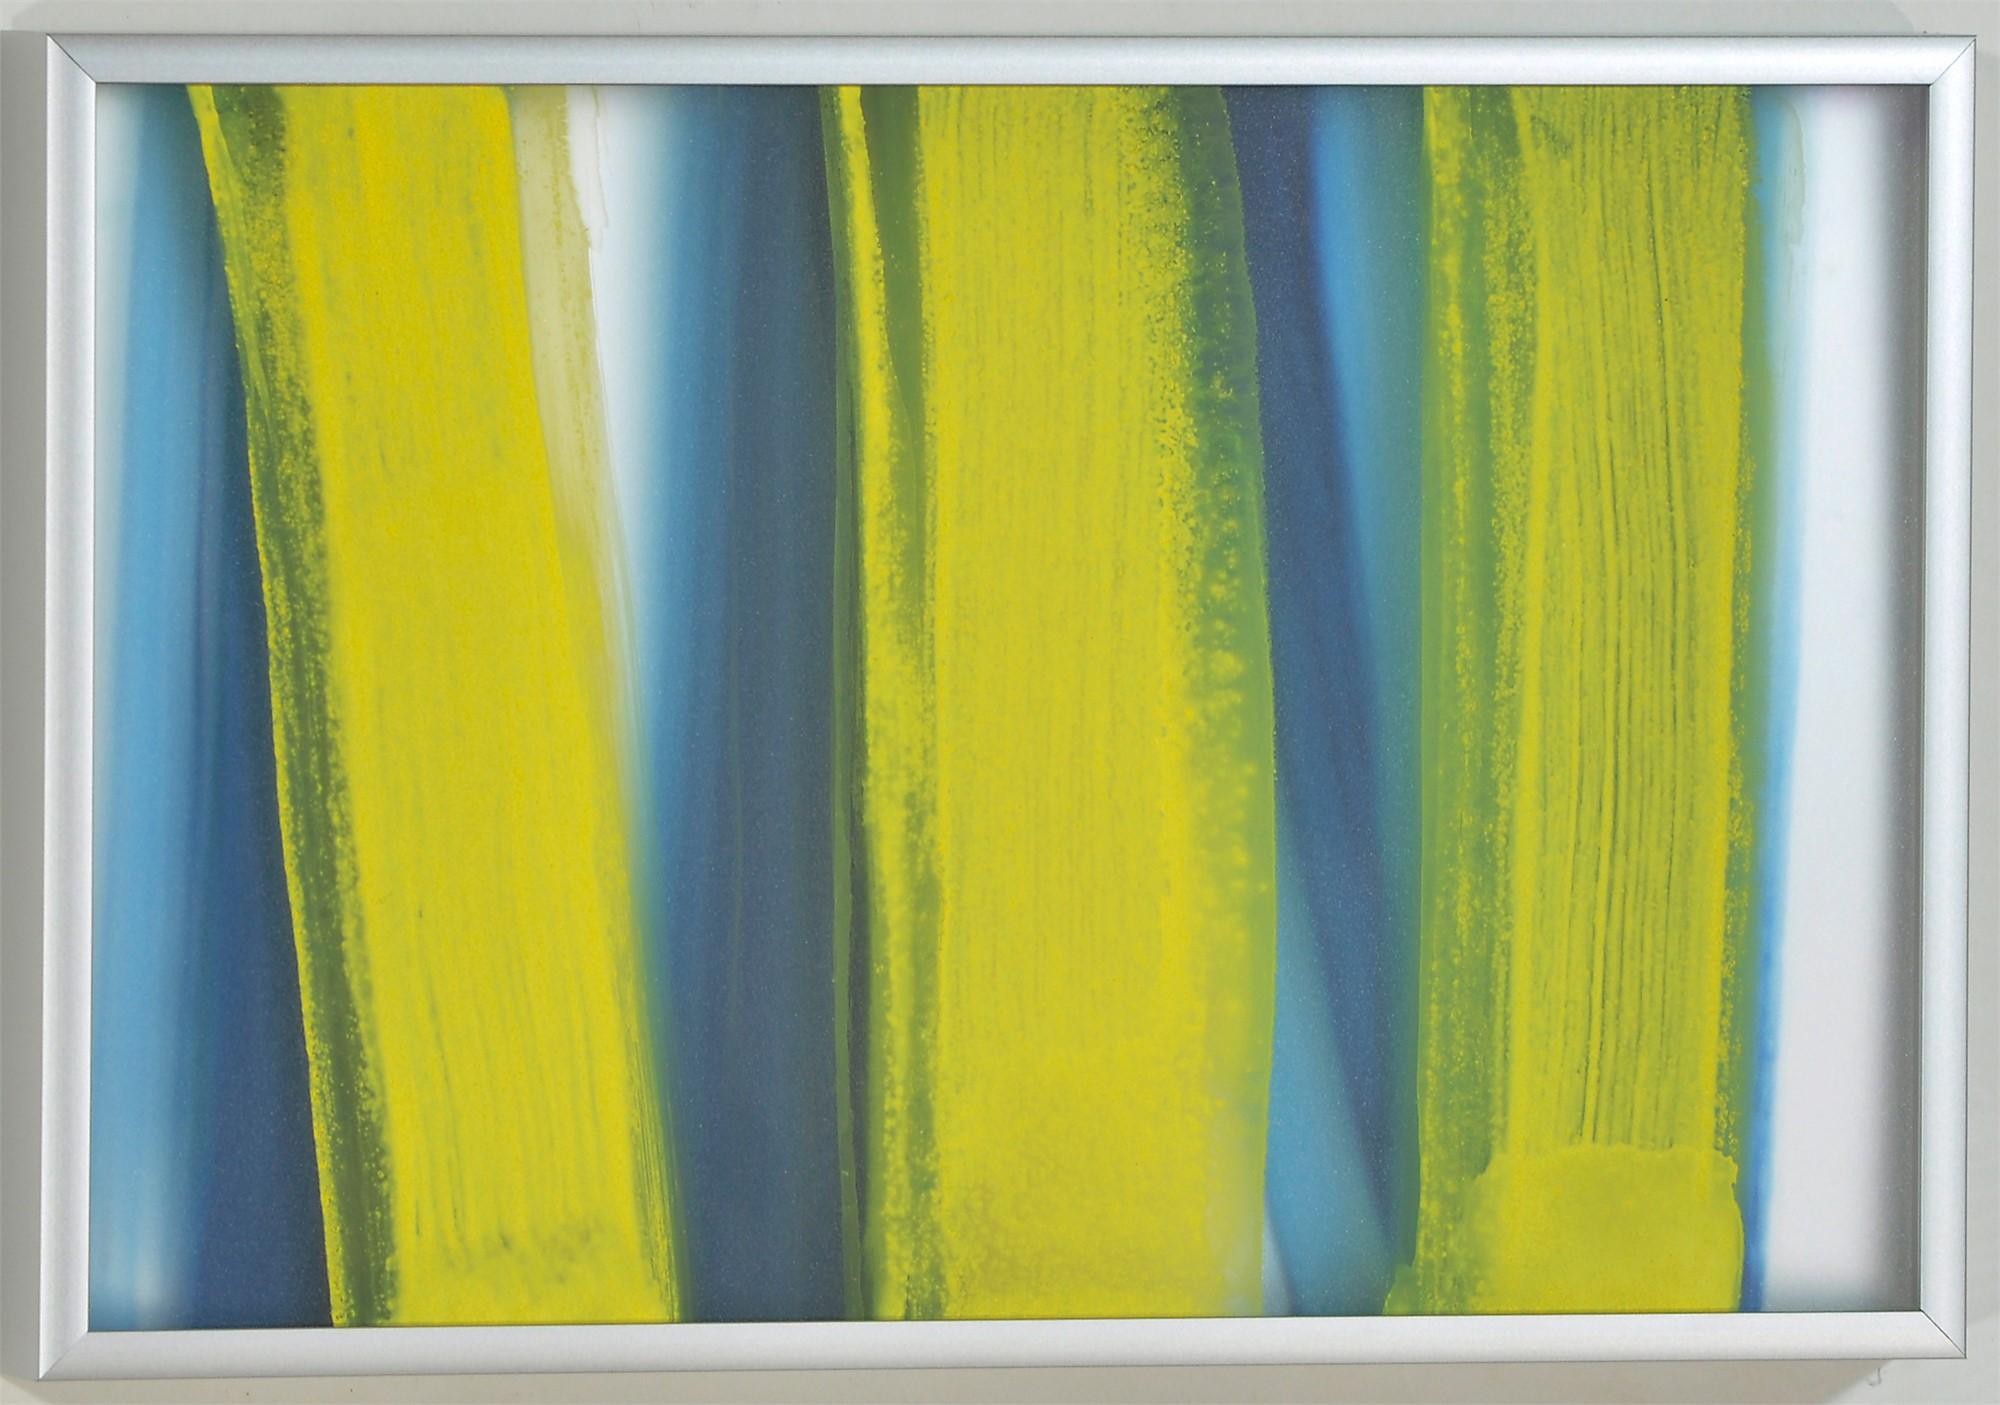 Sensing Lines 3 by Lucinda Cobley